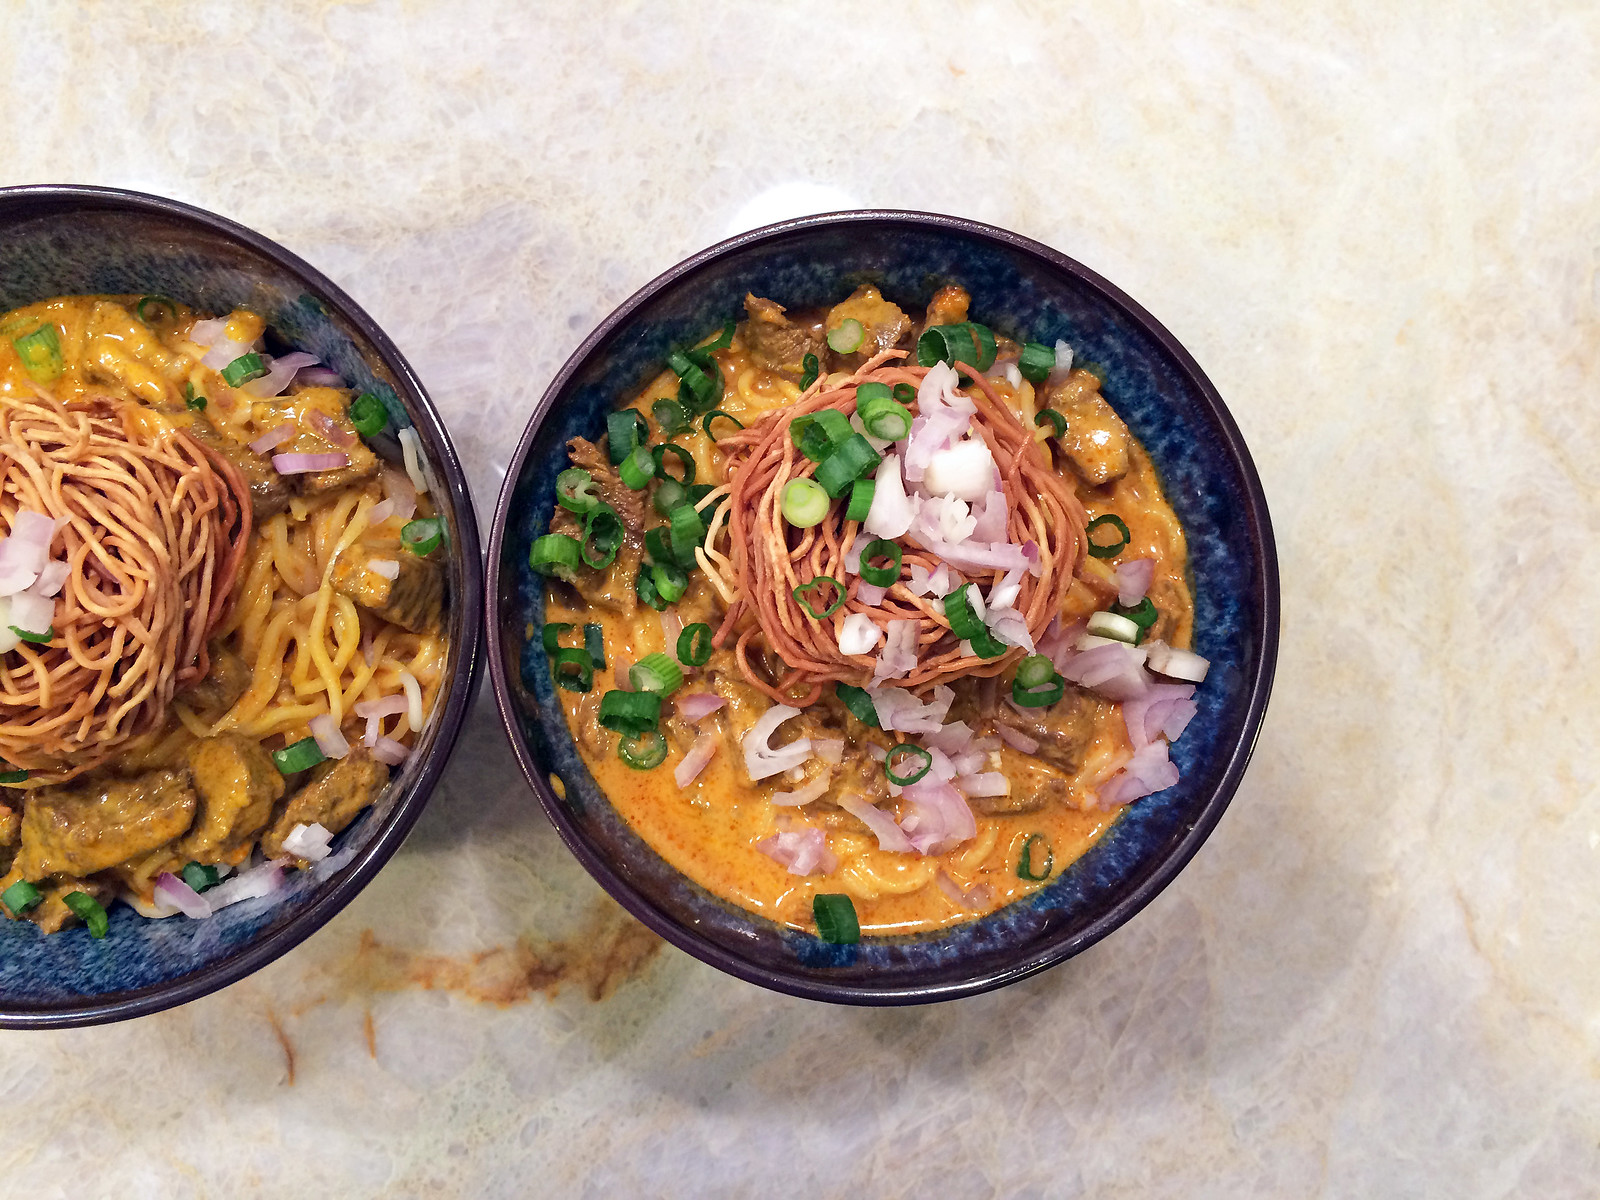 Chiang Mai curry noodles (khao soi)